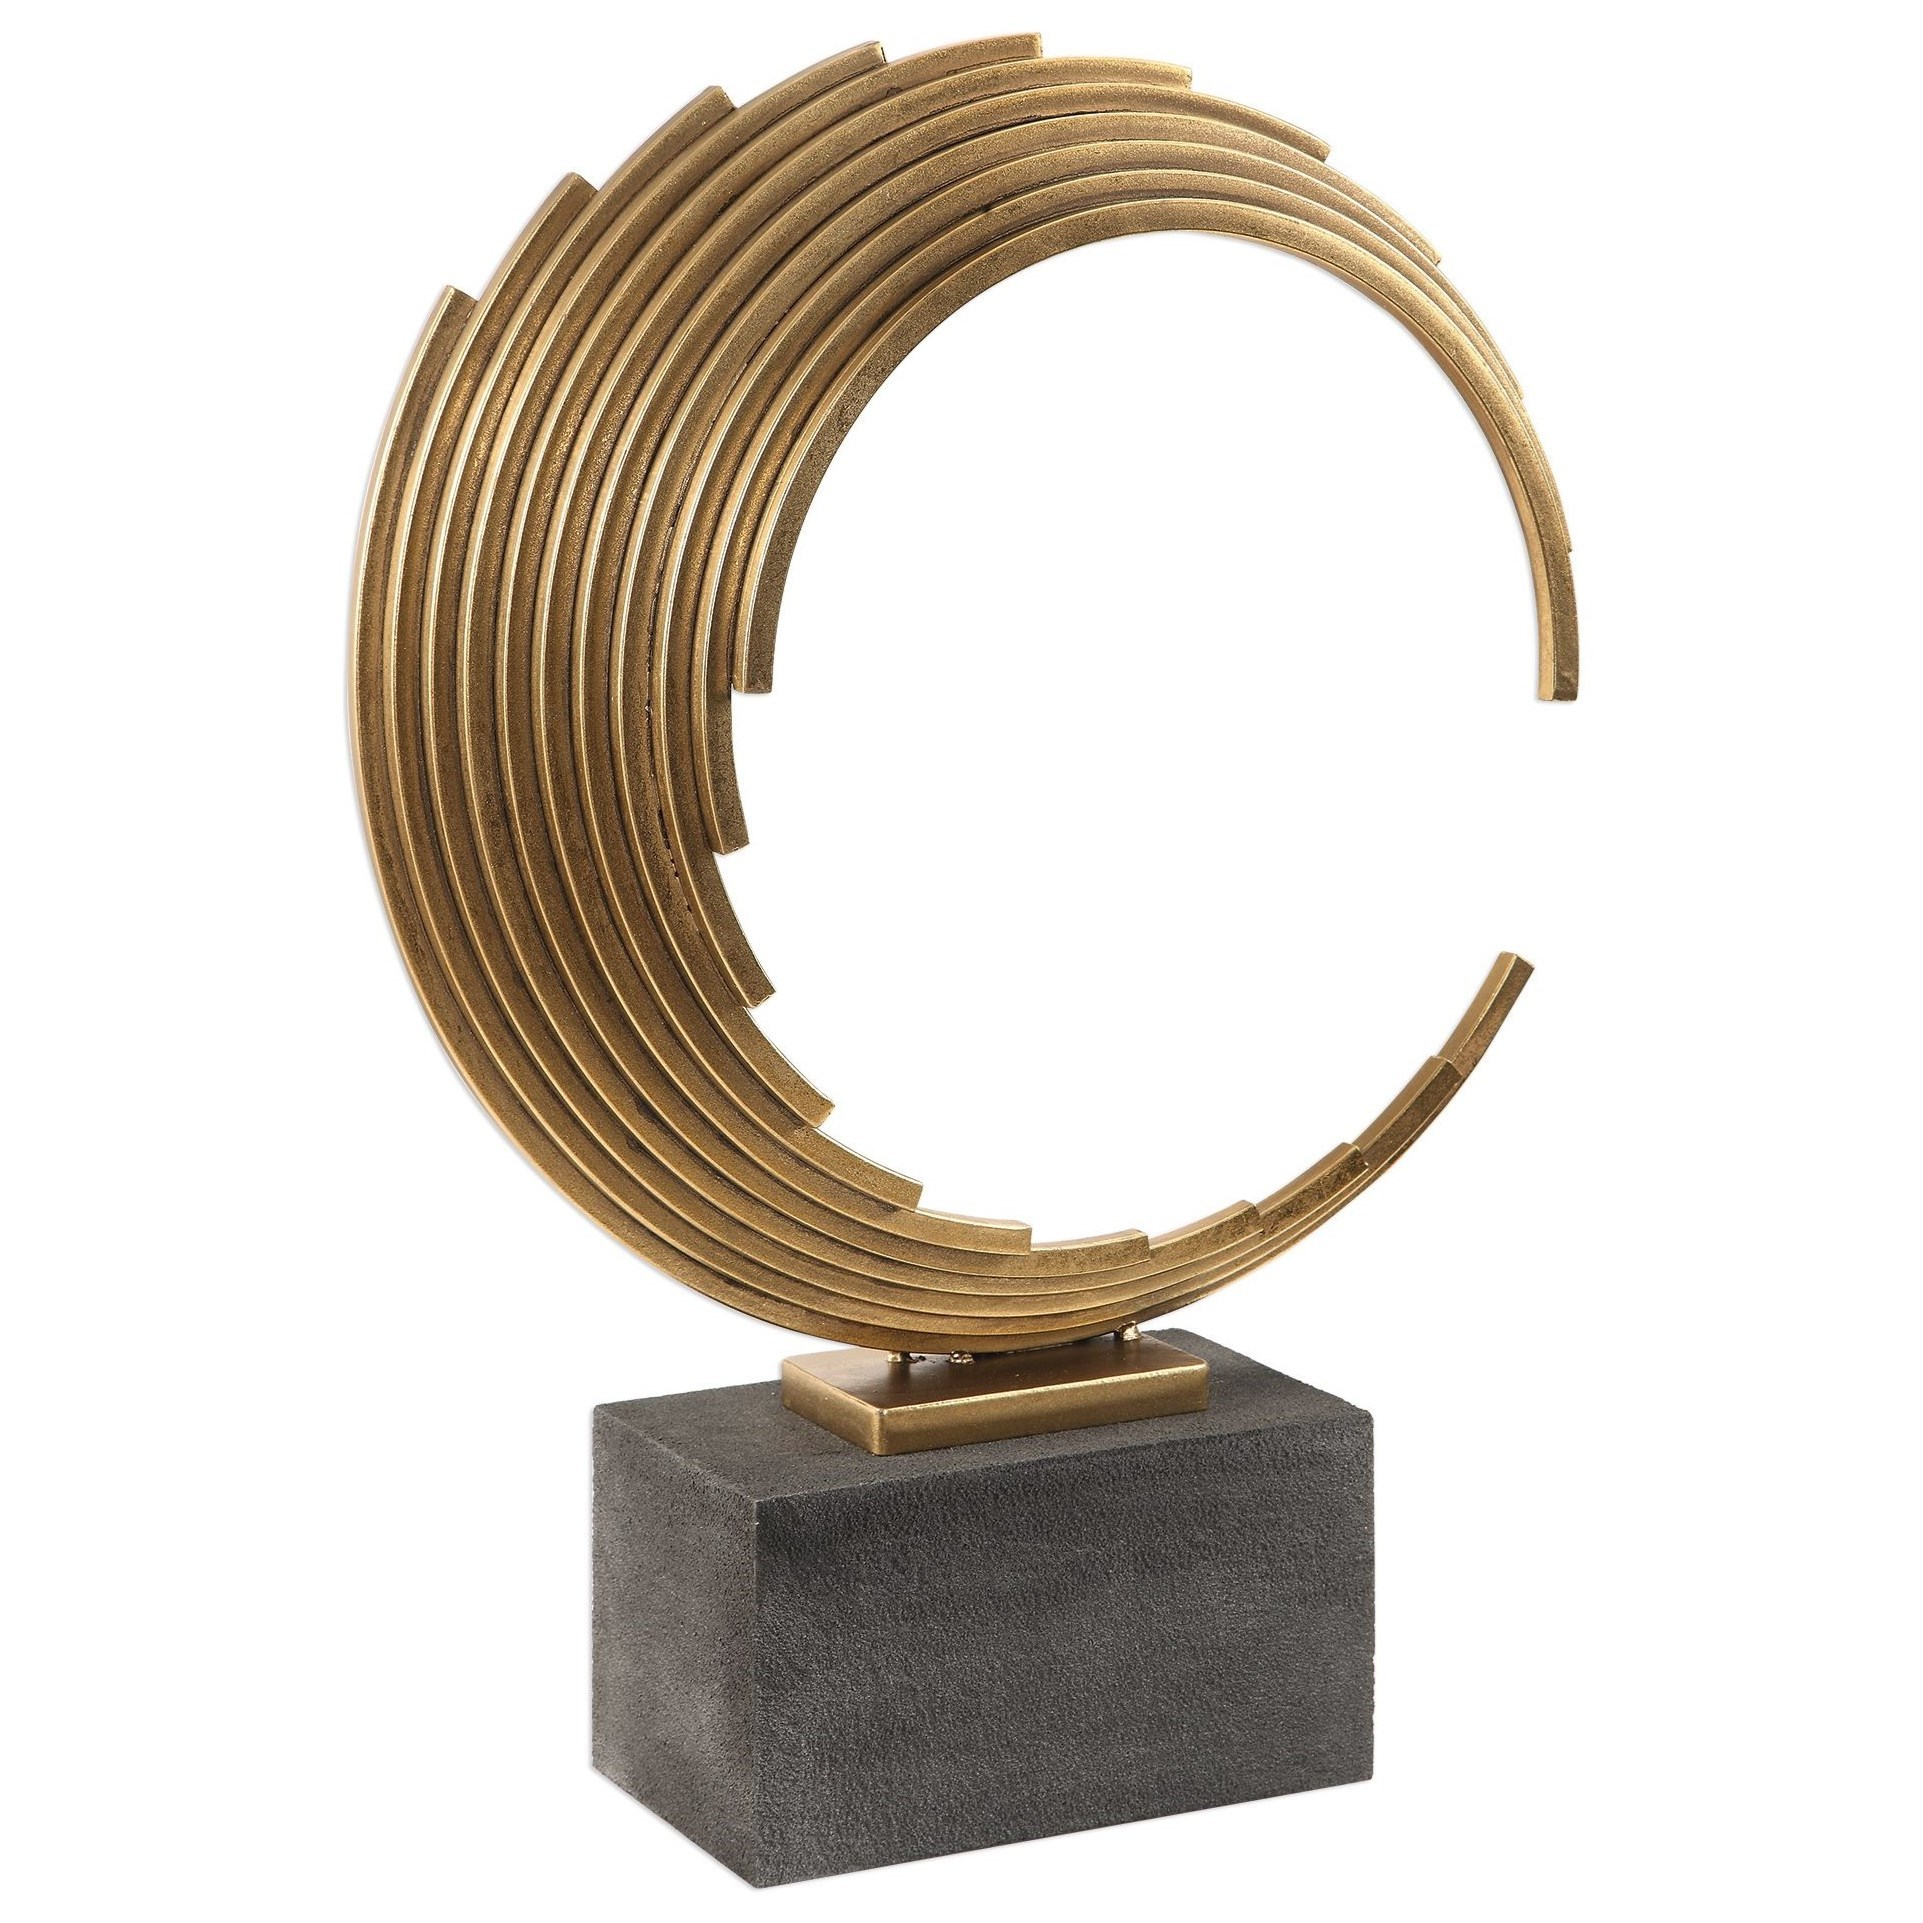 Saanvi Curved Gold Rods Sculpture